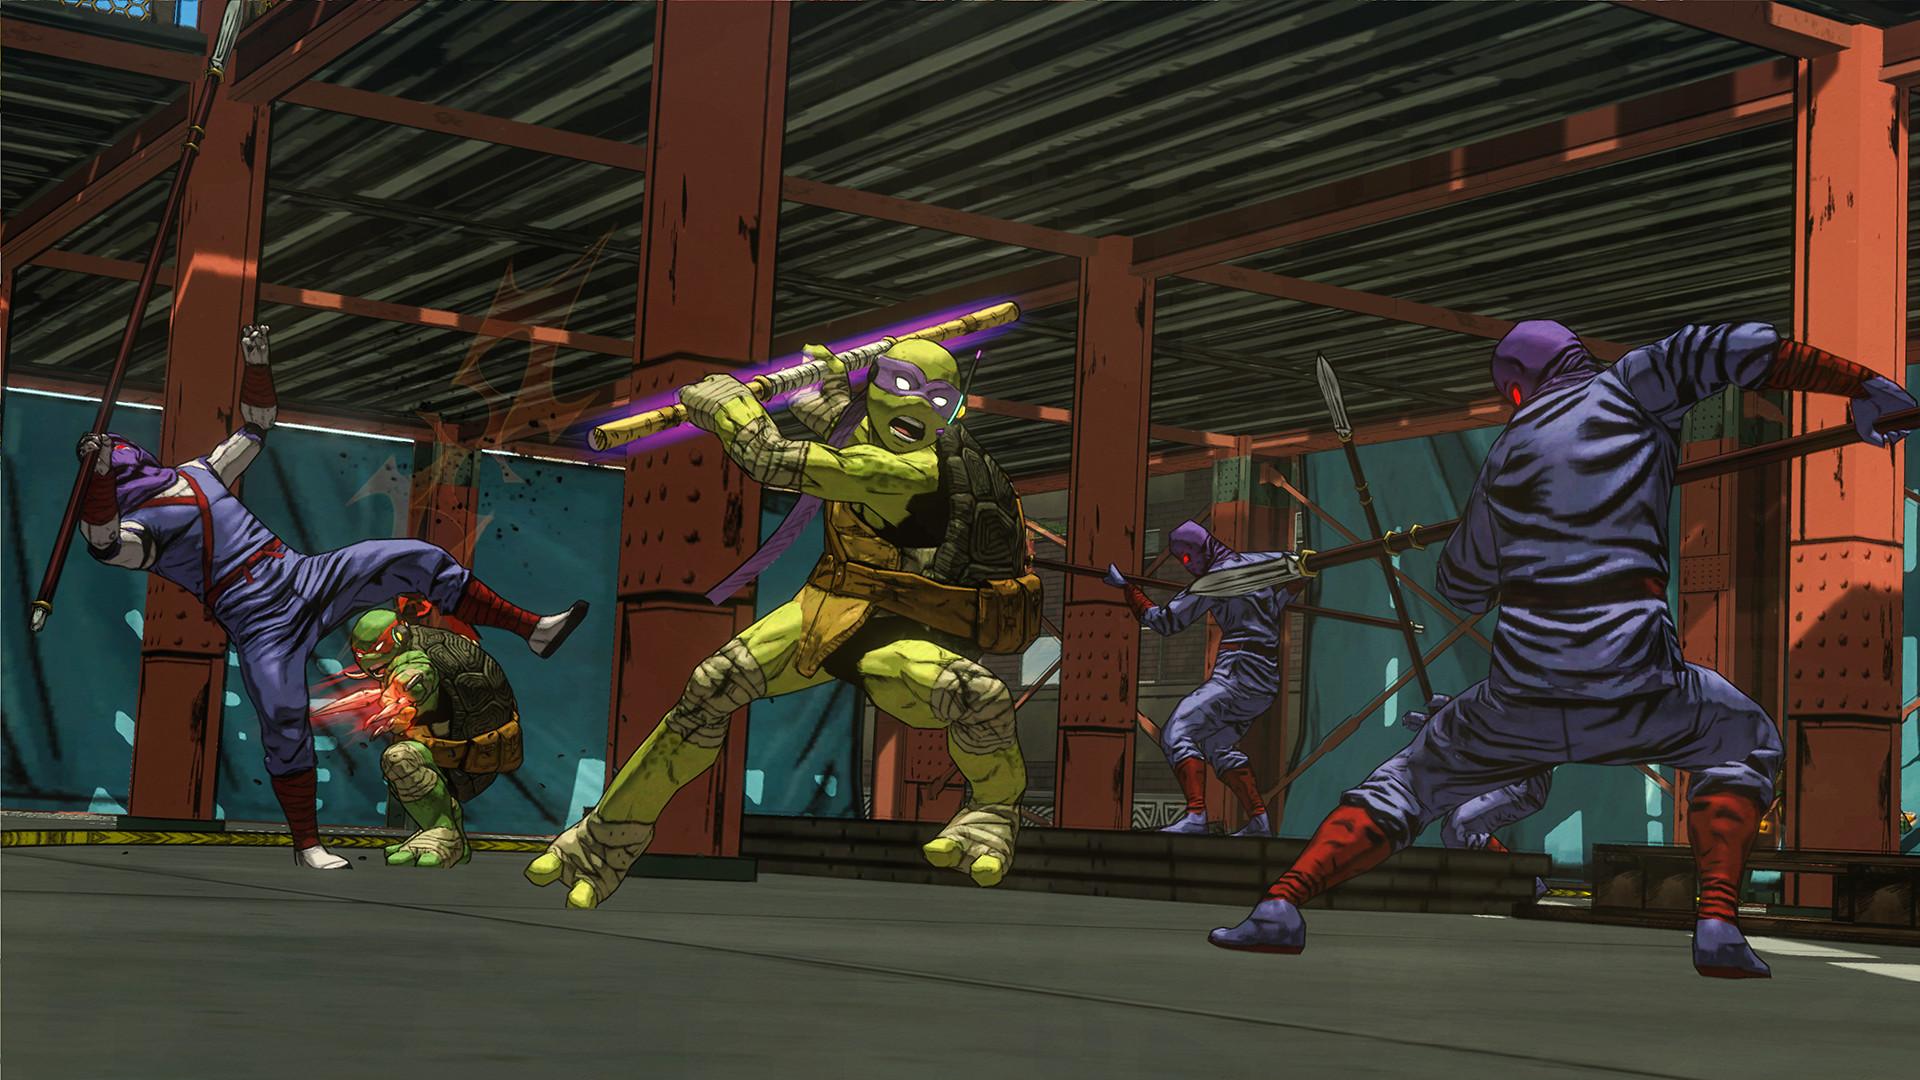 Teenage Mutant Ninja Turtles Mutants In Manhattan ESPAÑOL PC Full (CODEX) + REPACK 2 DVD5 (JPW) 6